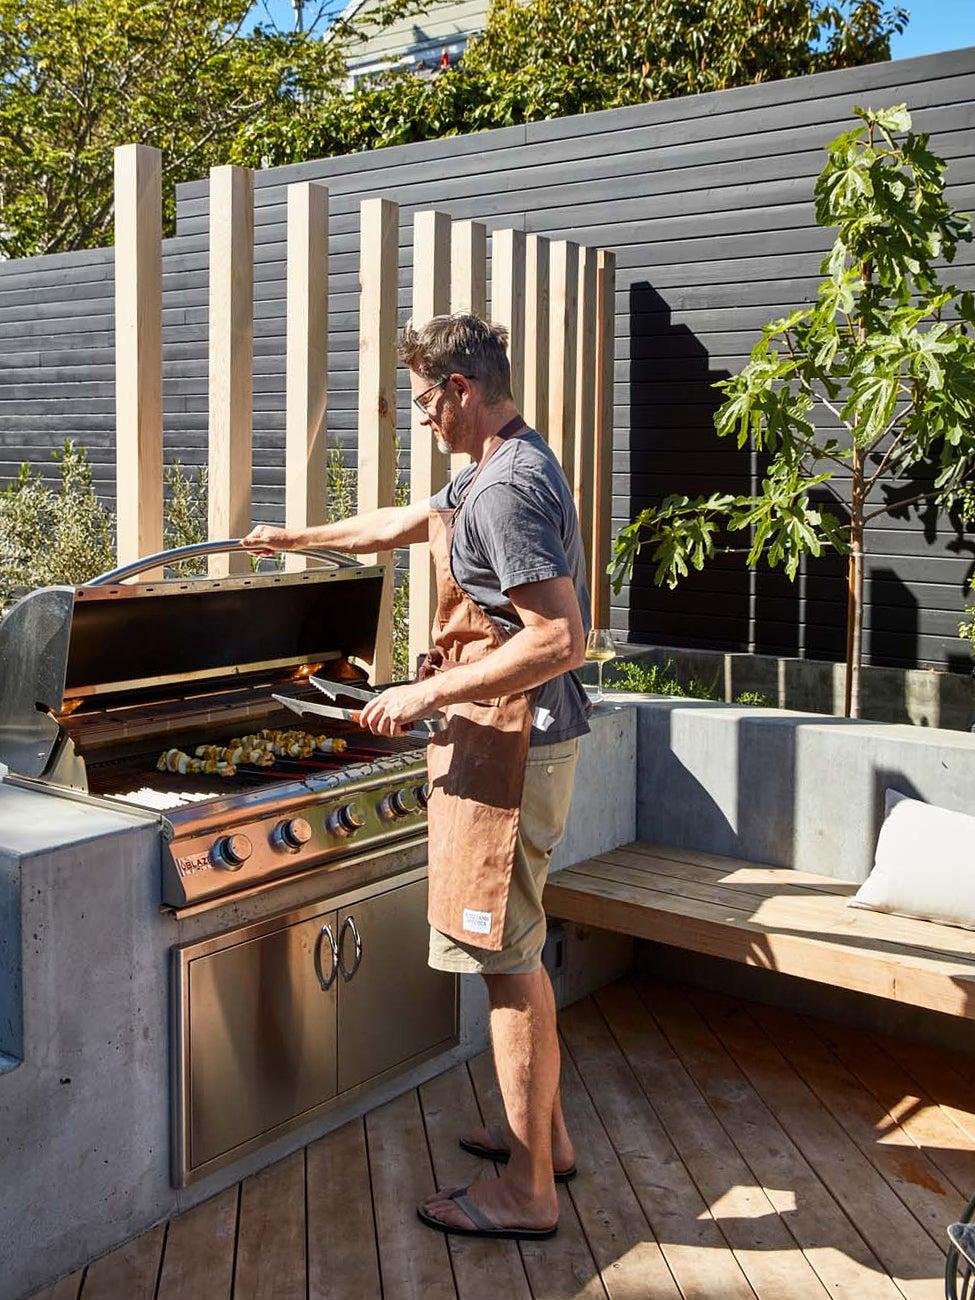 Erin Hiemstra's husband grilling